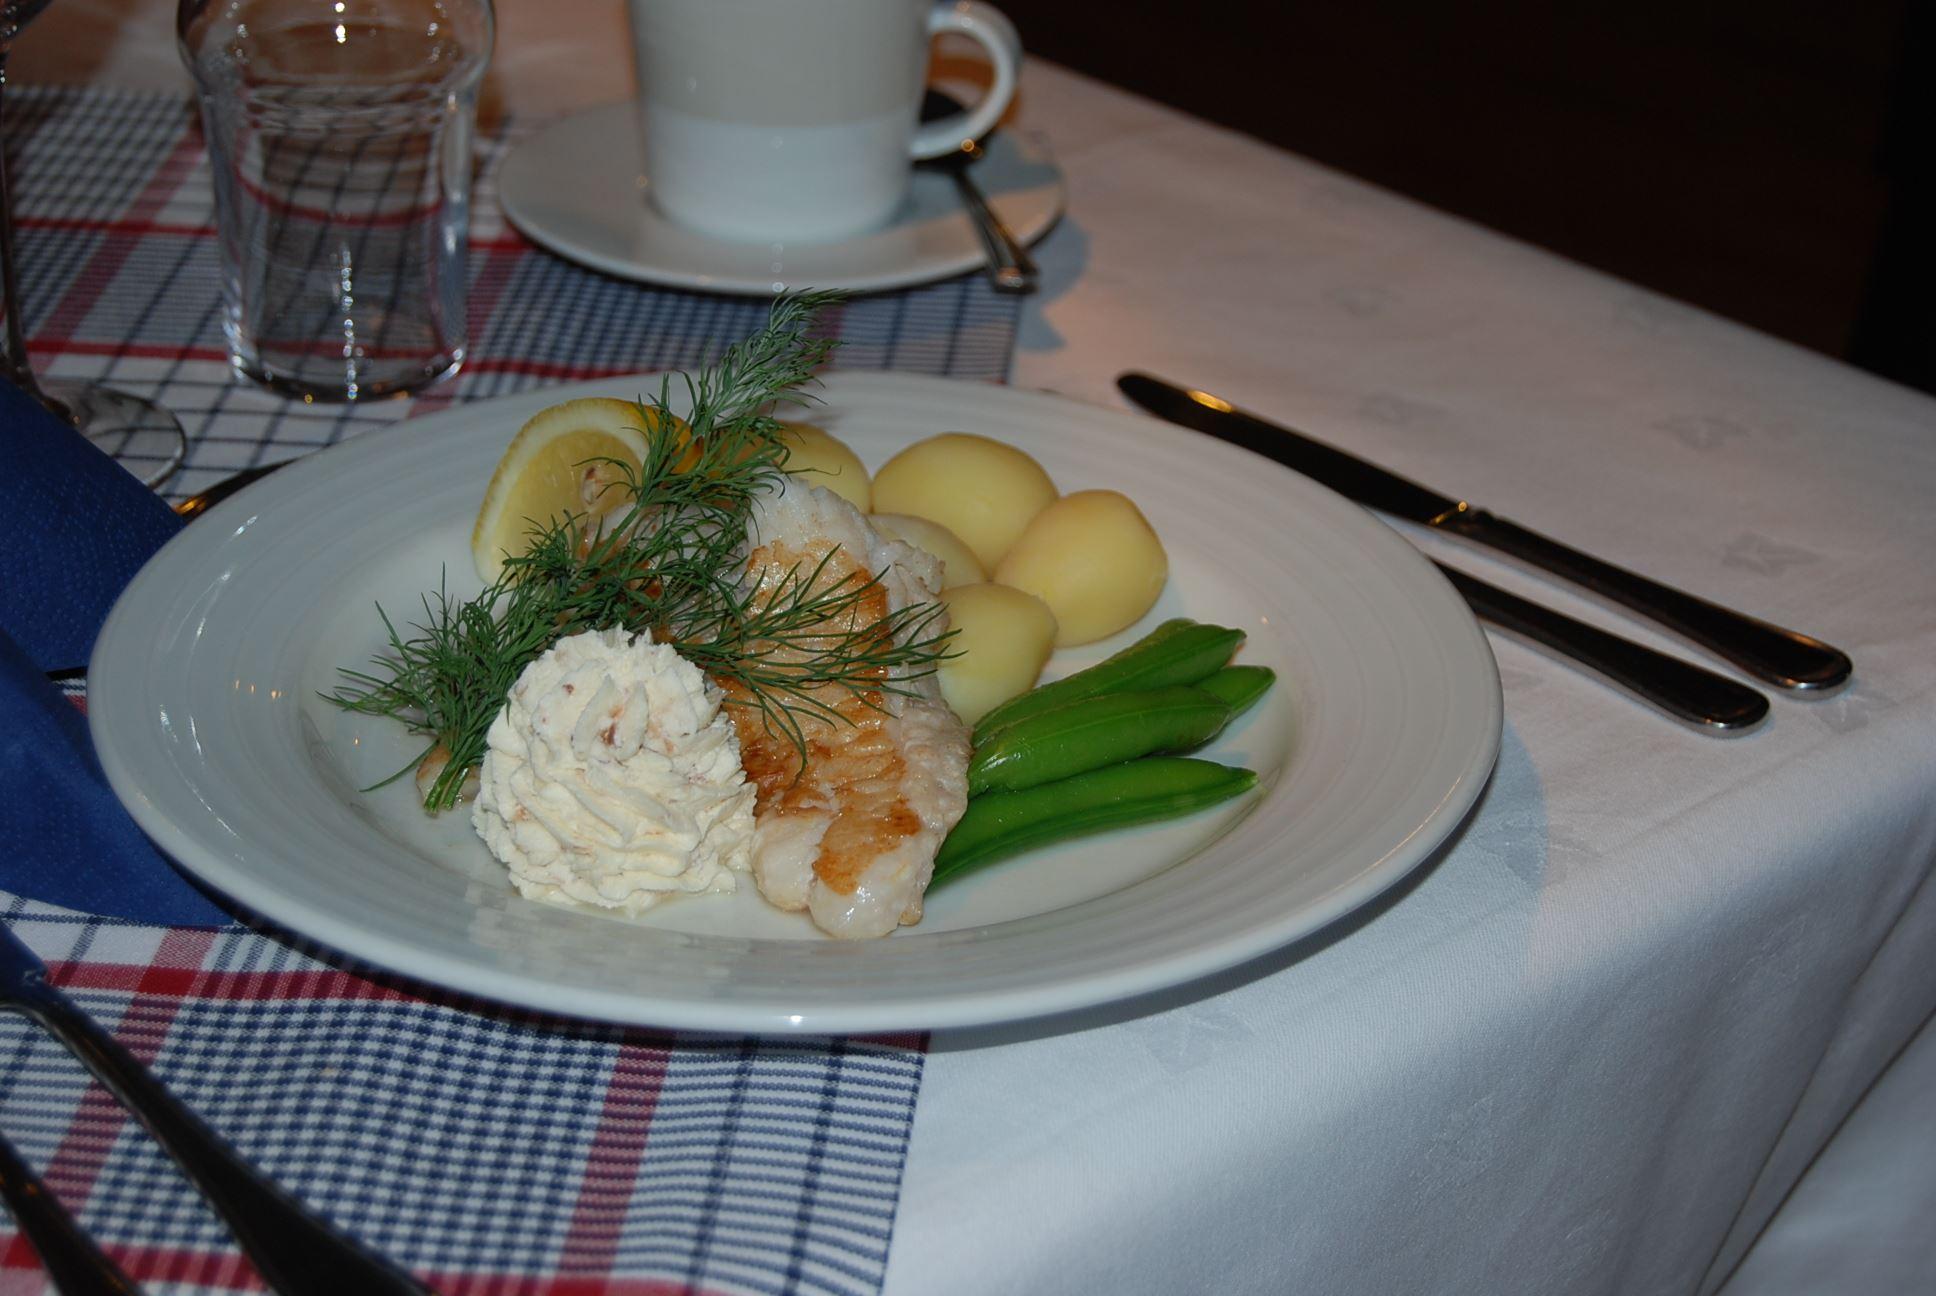 Dala Wärdshus Hantverksbyn